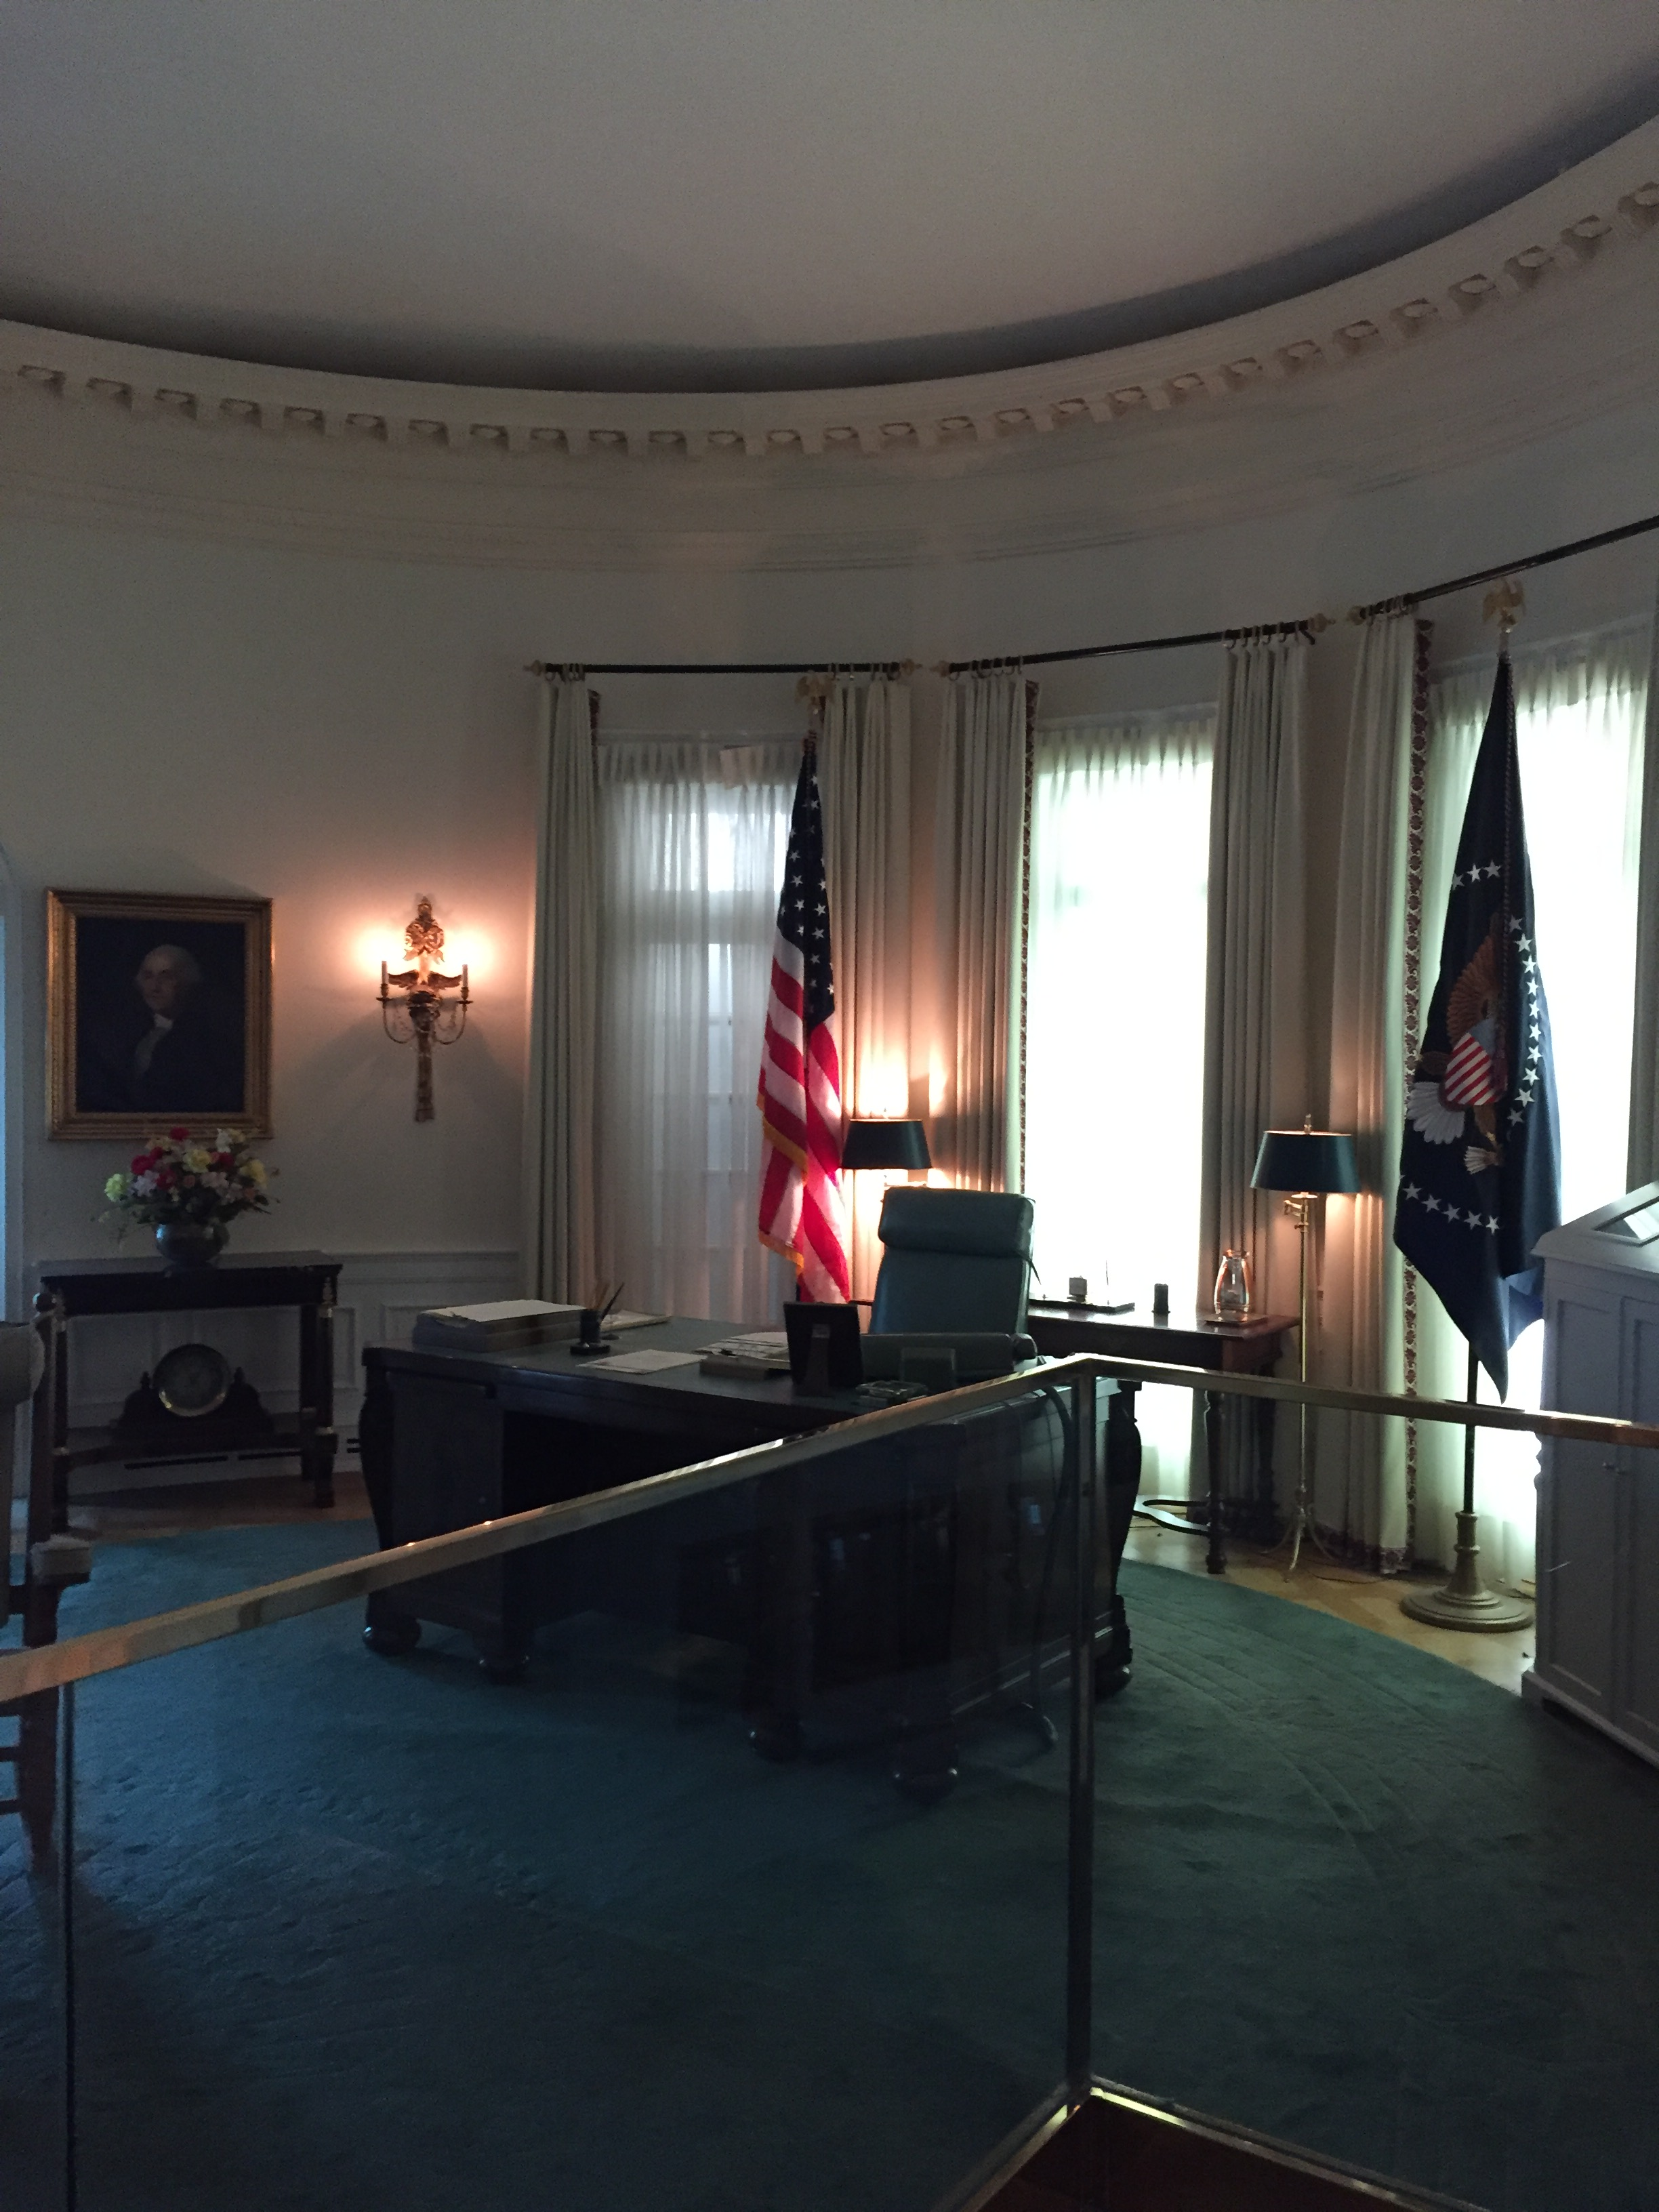 Weekly Adventure Lbj Presidential Library Museum I